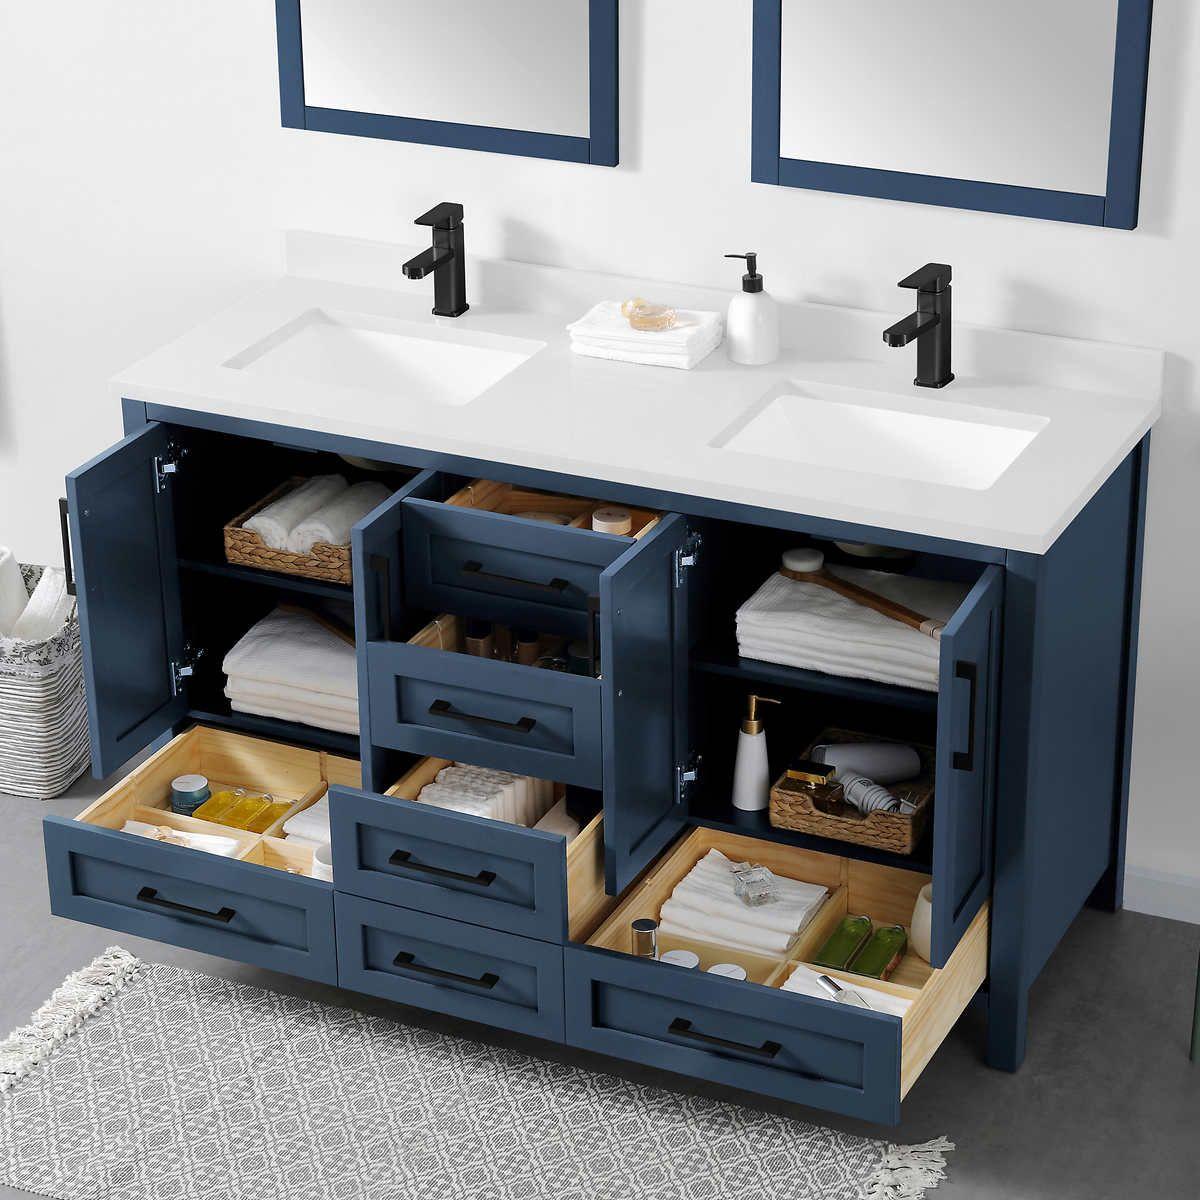 Ove Decors Lourdes 60 Bath Vanity In 2021 Custom Bathroom Vanity Full Bathroom Remodel Master Bathroom Vanity